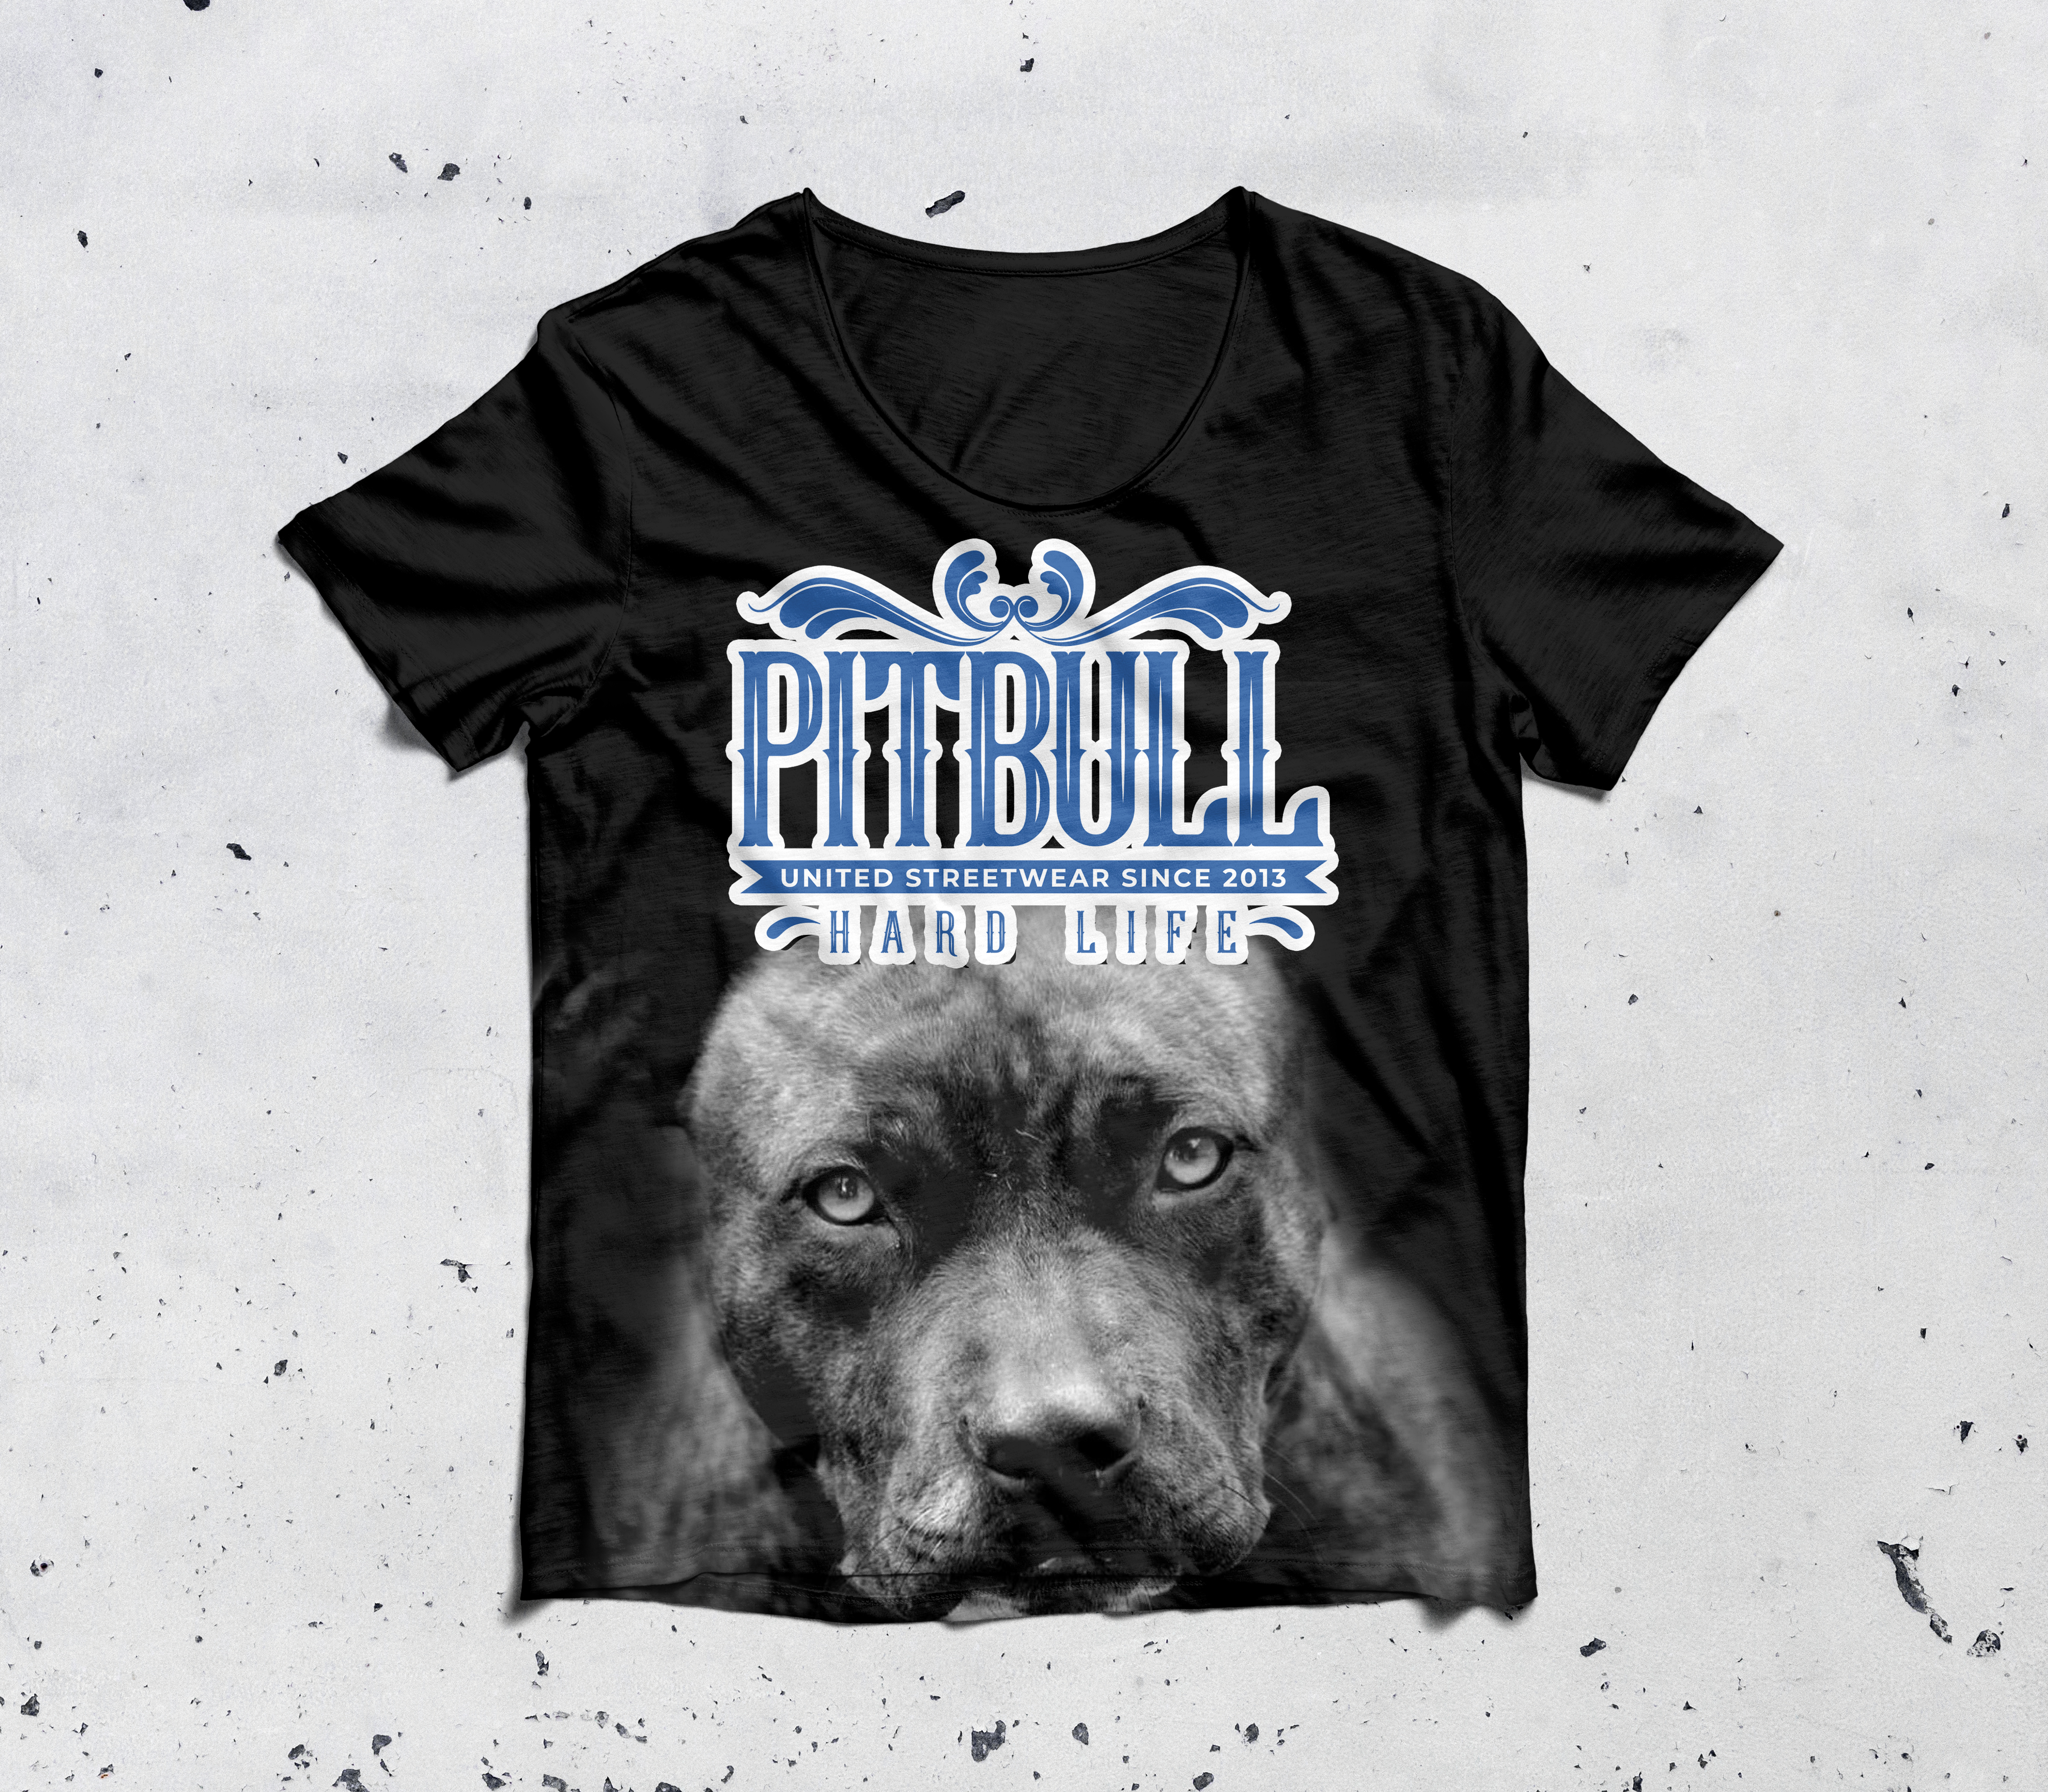 Create Professional And Creative Tshirt Design